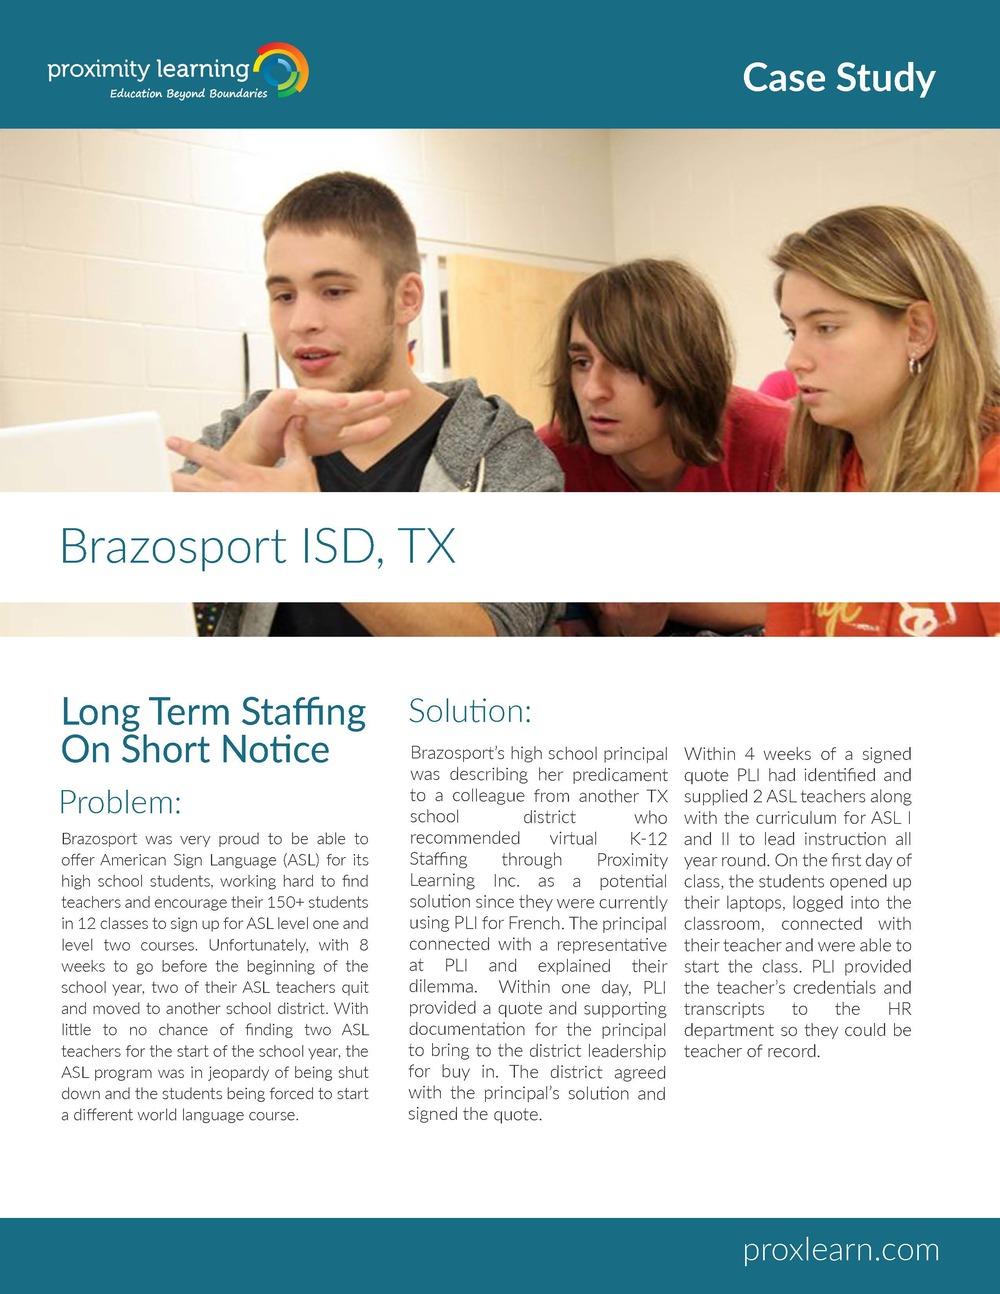 Brazosport ISD